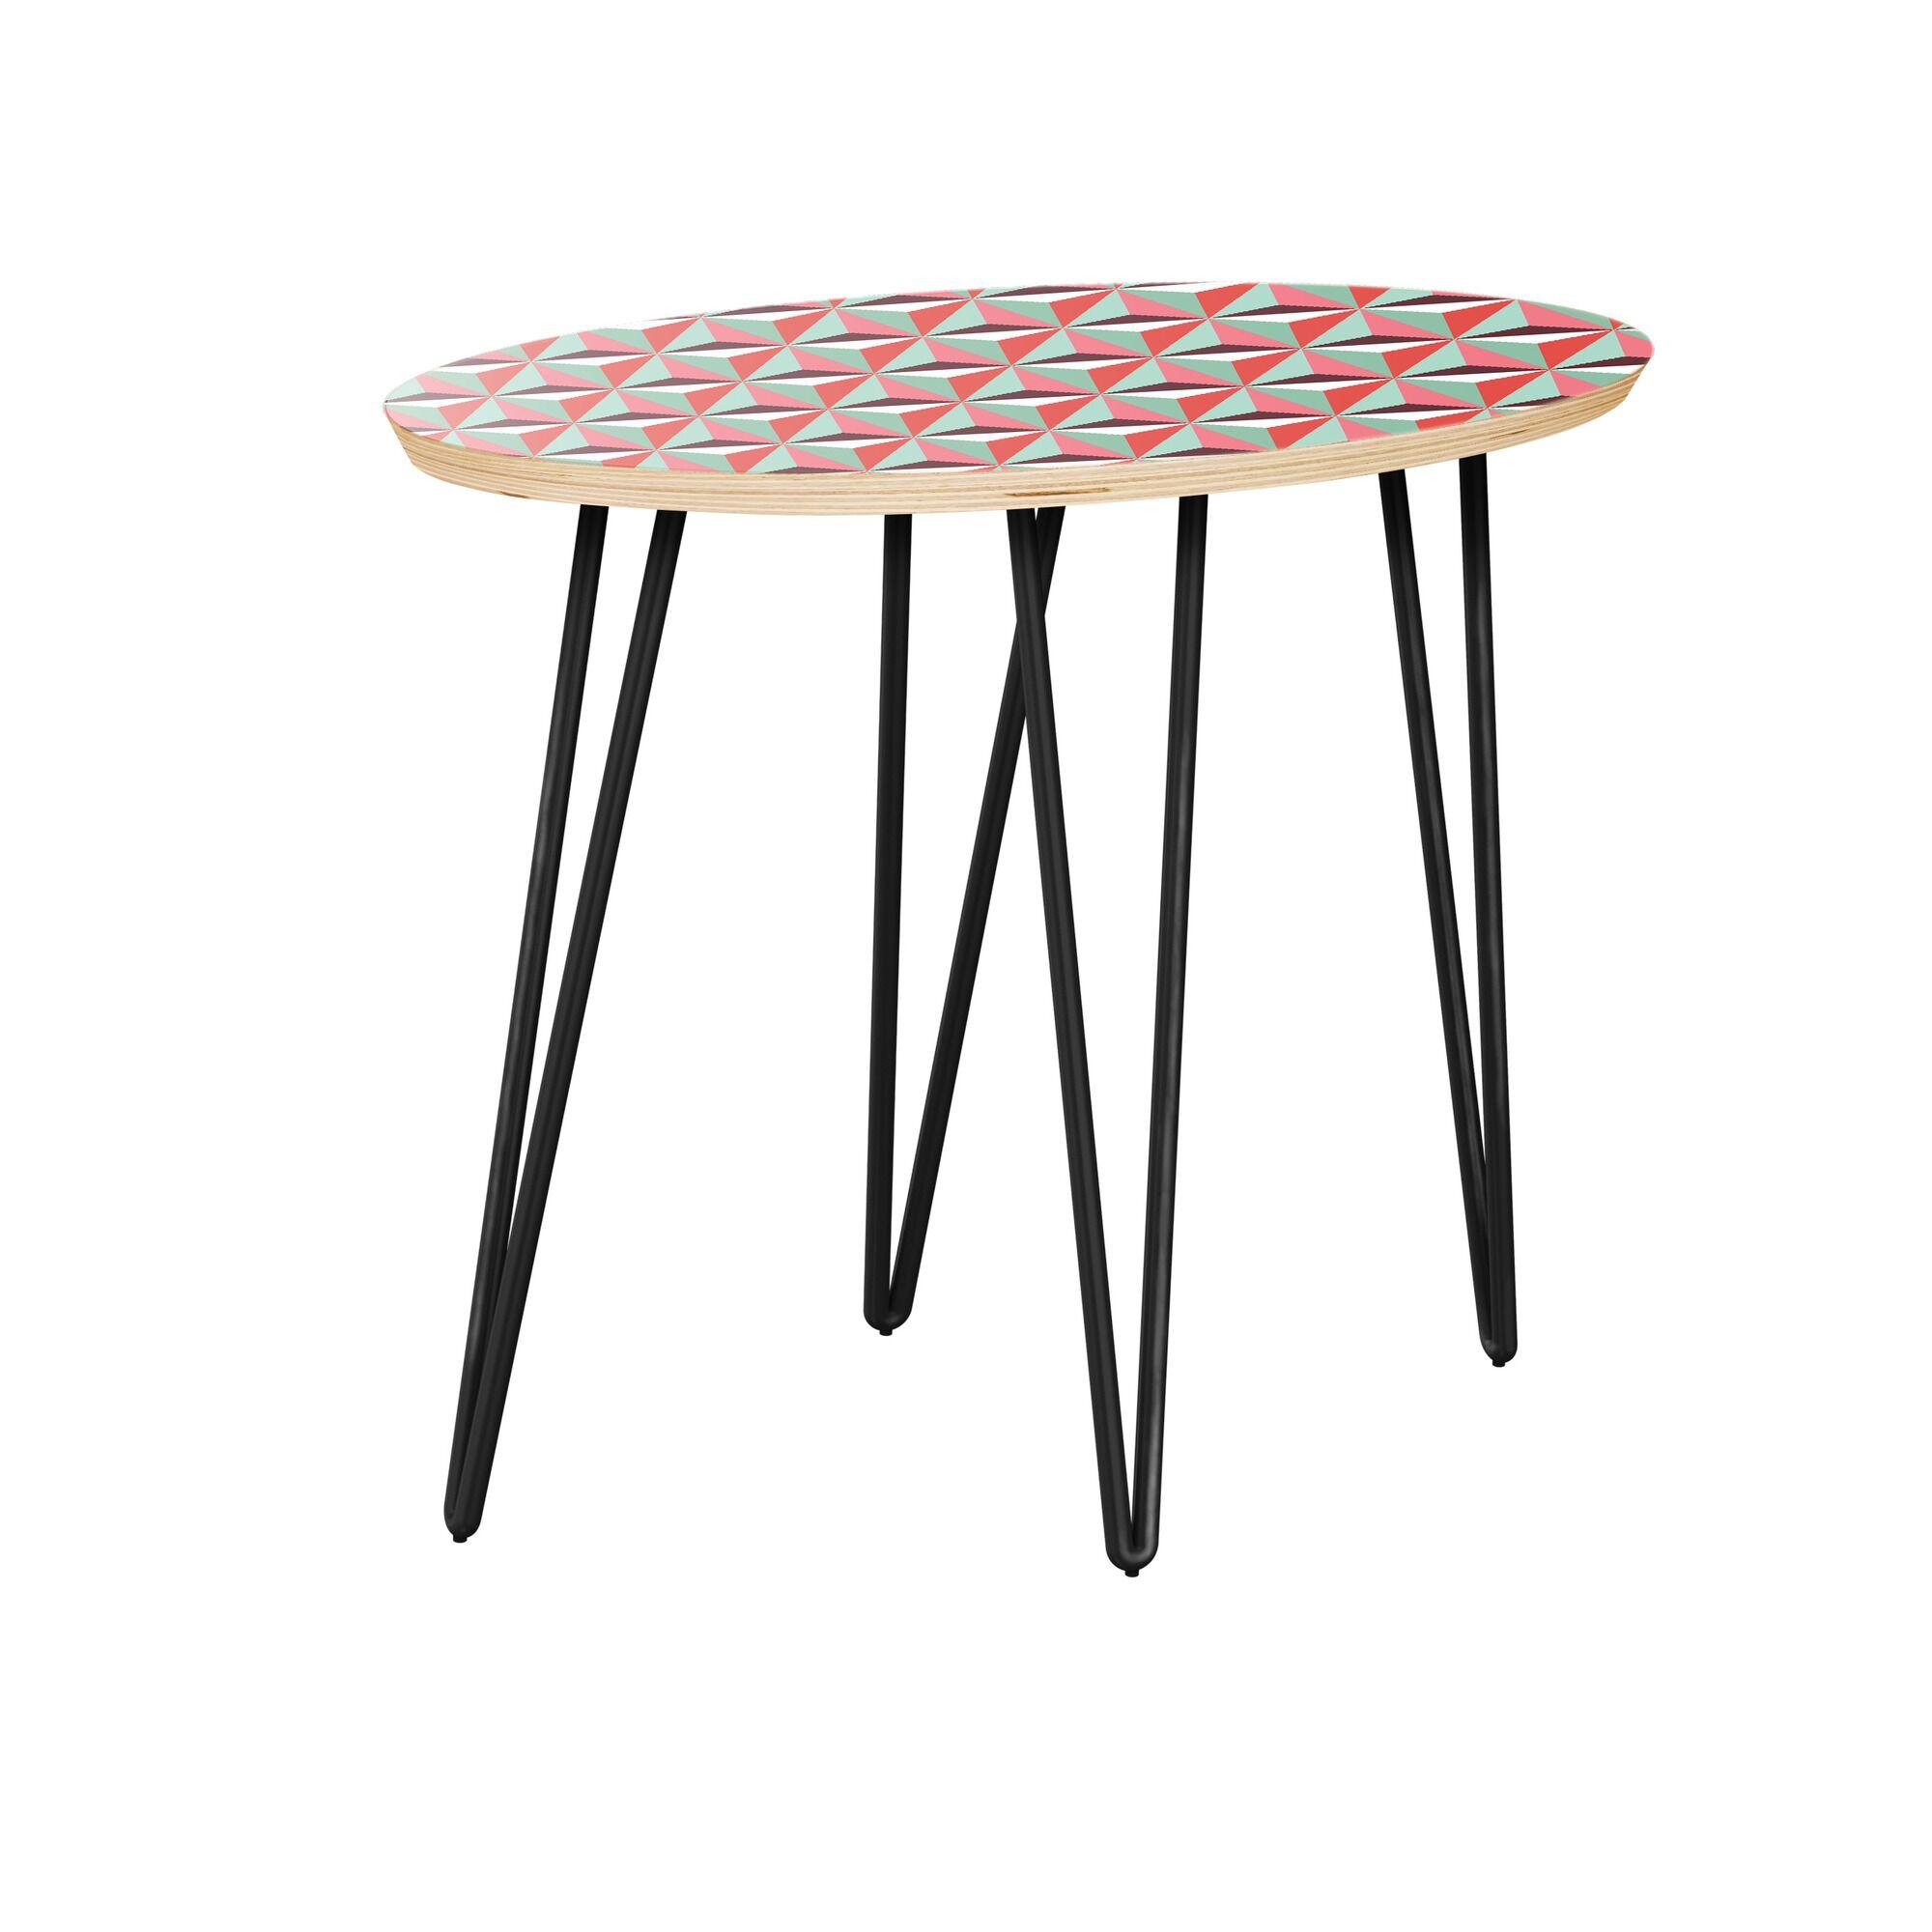 Lakeshia End Table Table Top Color: Natural, Table Base Color: Black